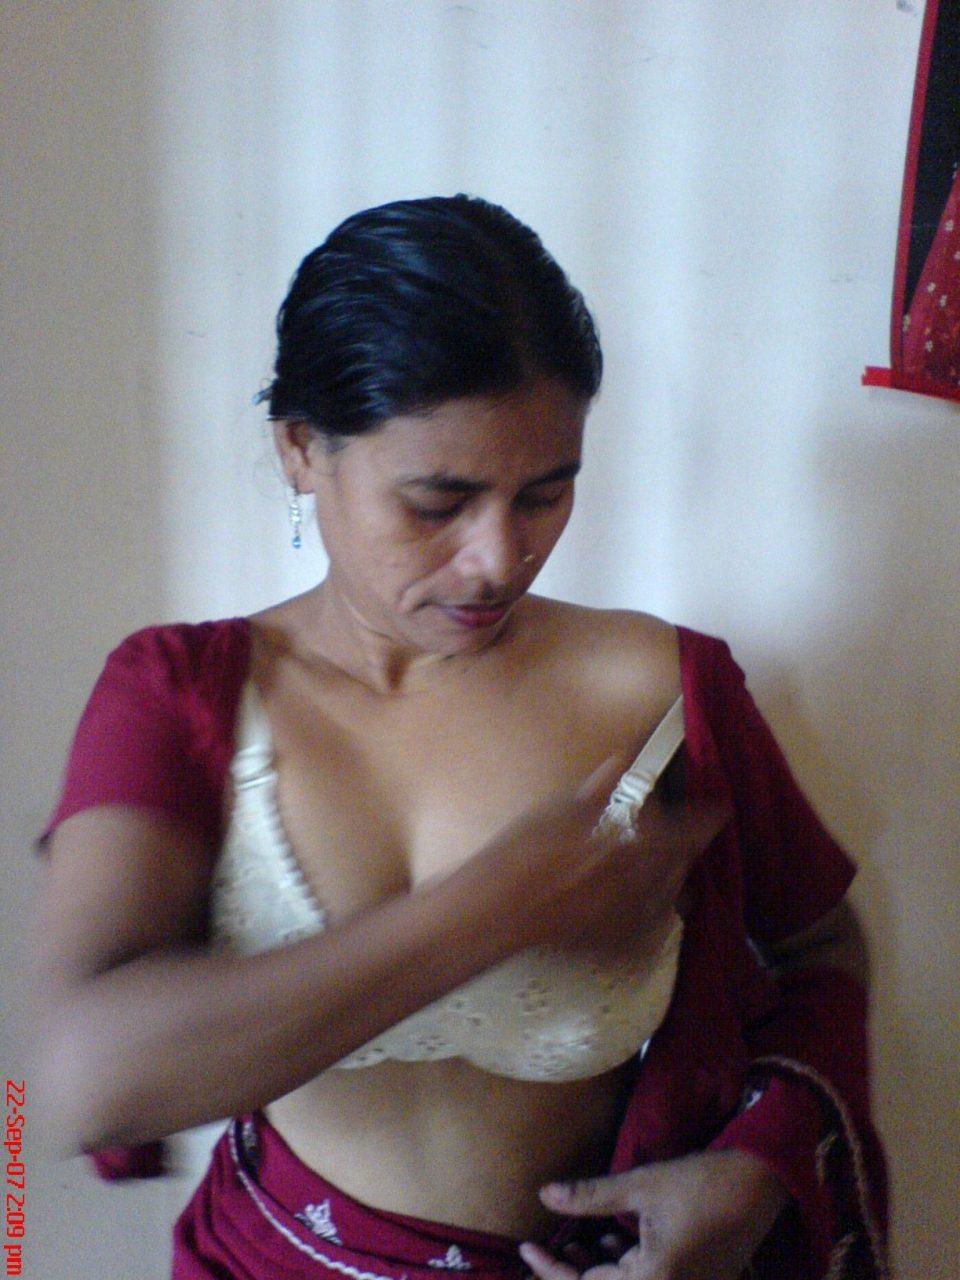 from Kolton gujarathi xxx fat pussy image